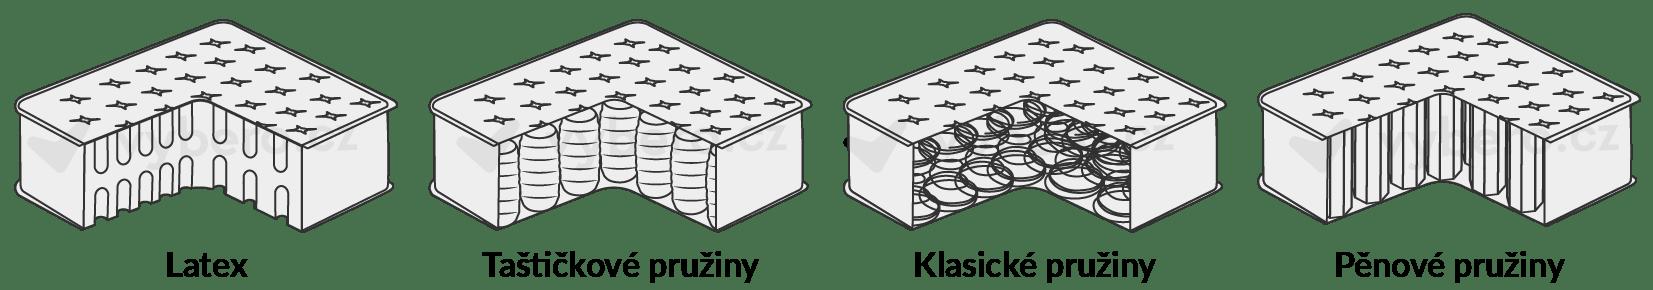 Různé typy materiálů matrace